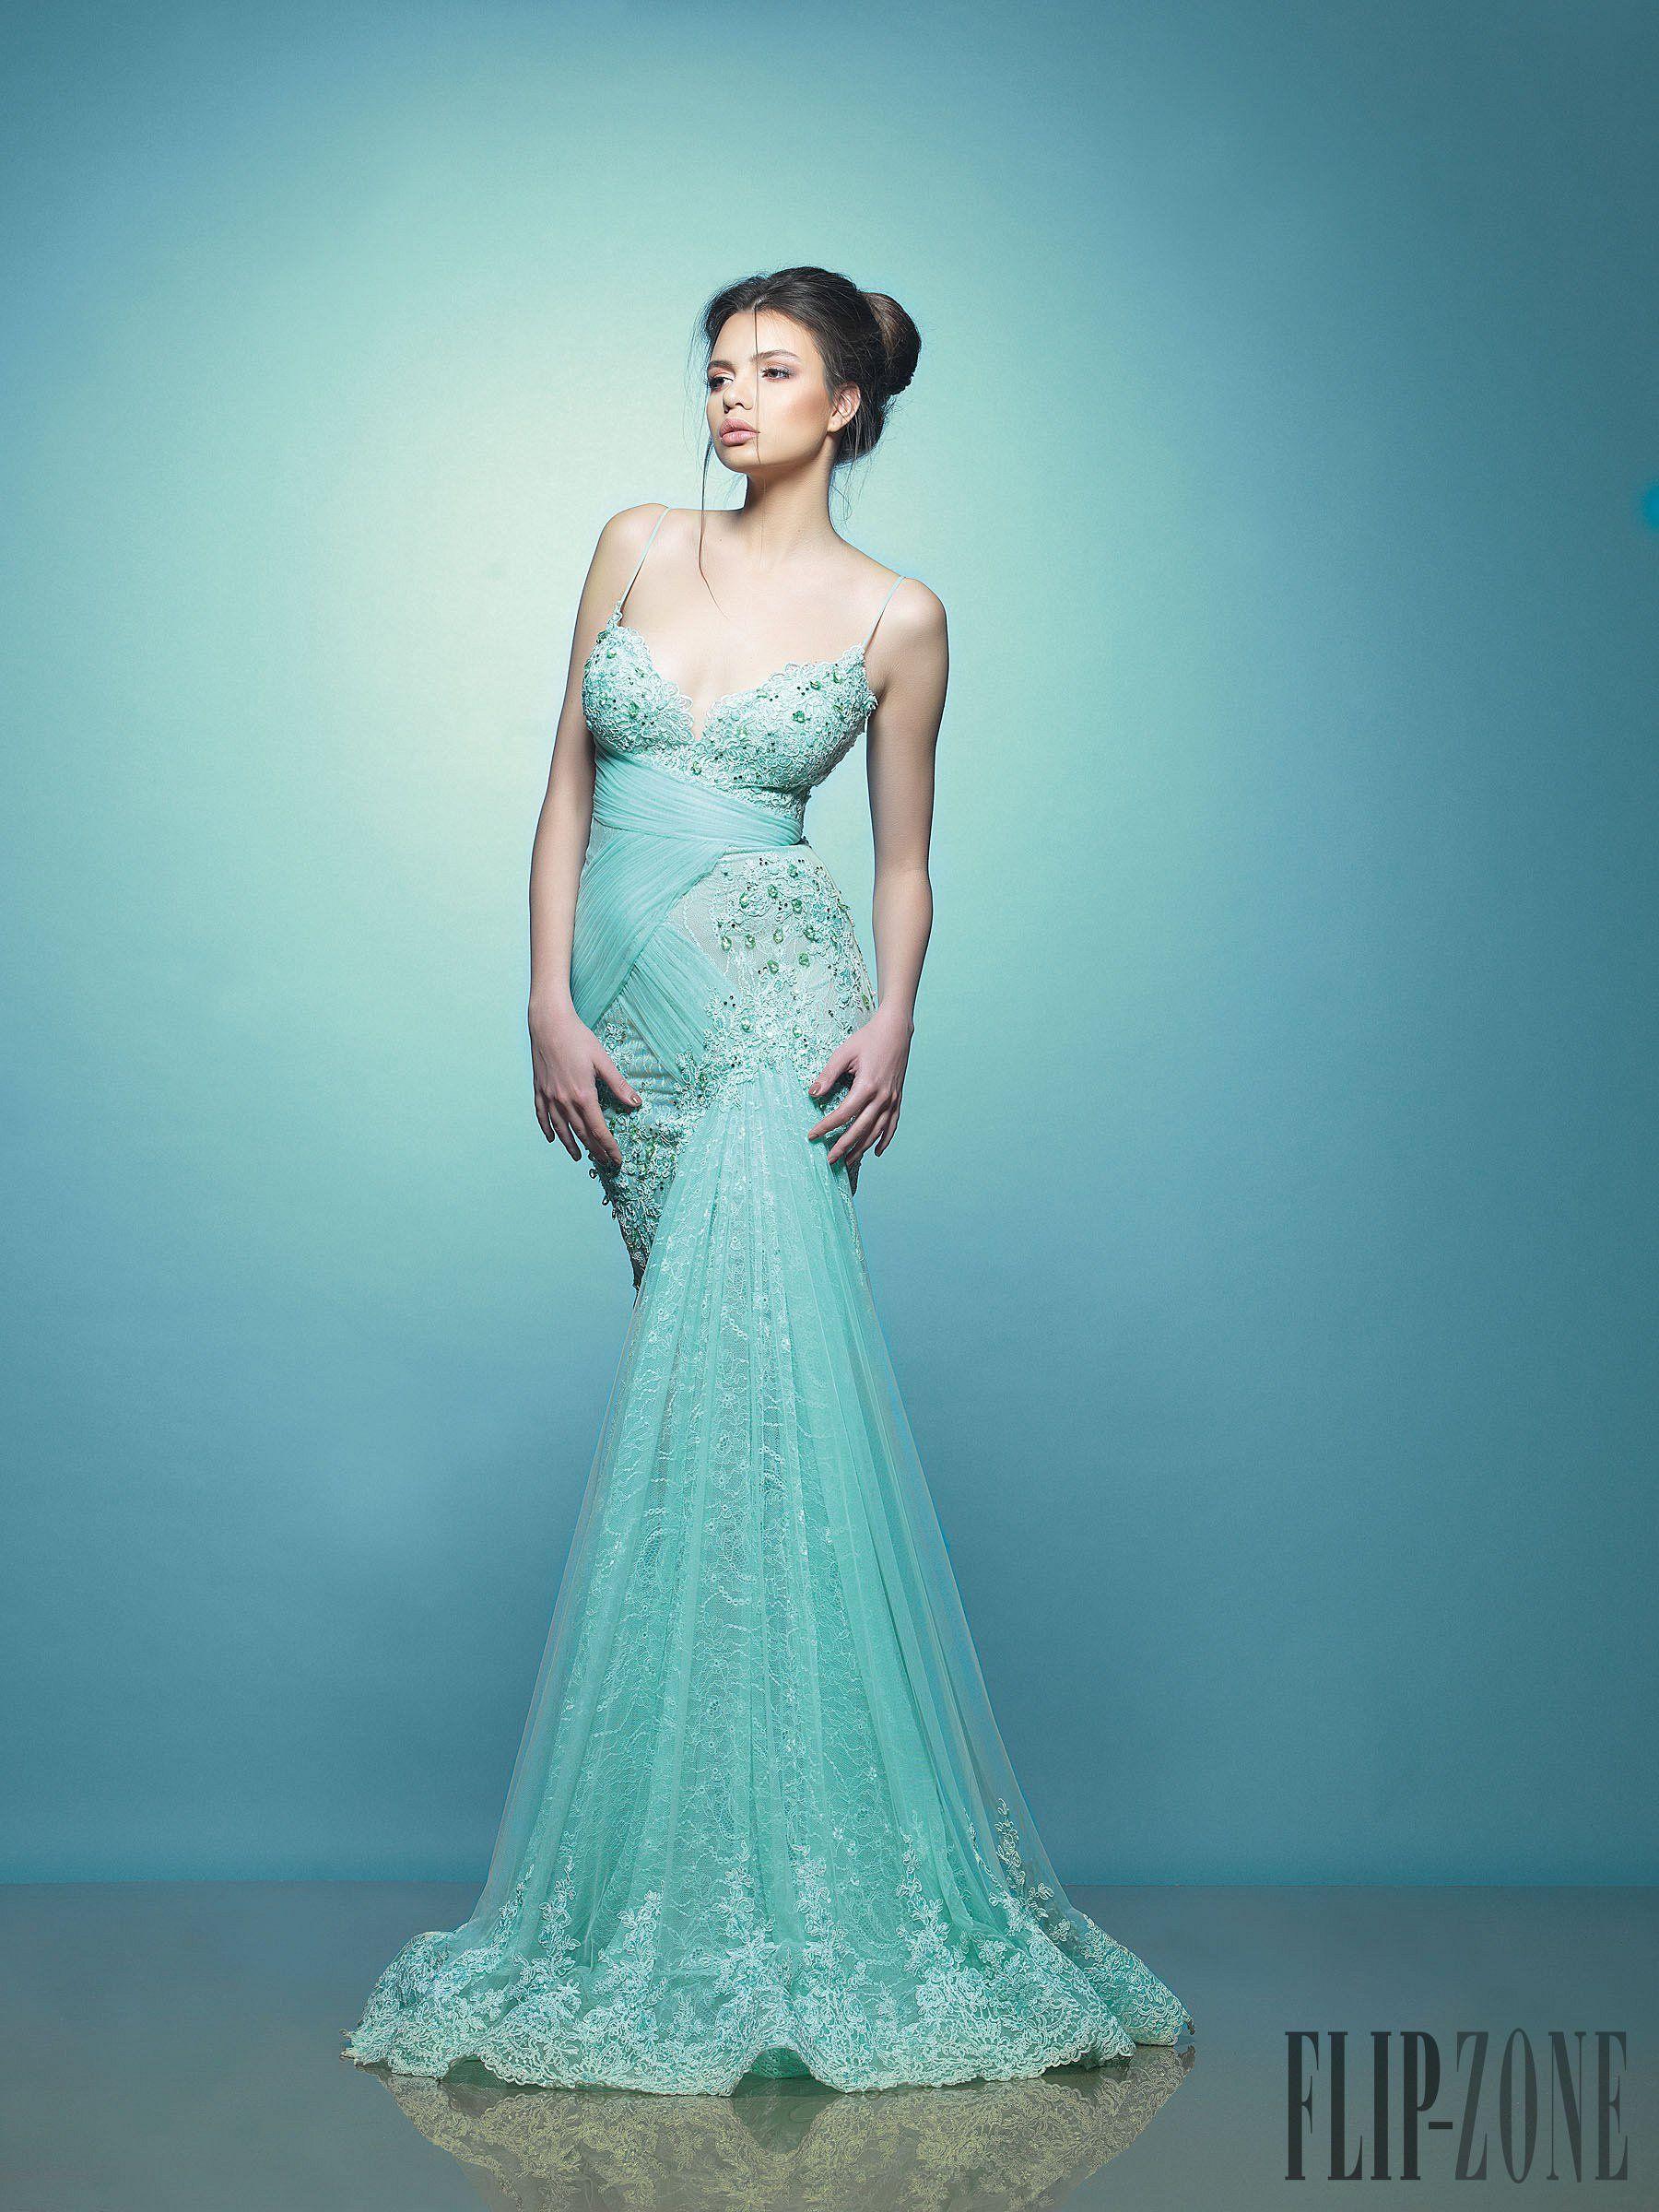 Perfect Www.wedding Dresses 2015 Vignette - All Wedding Dresses ...